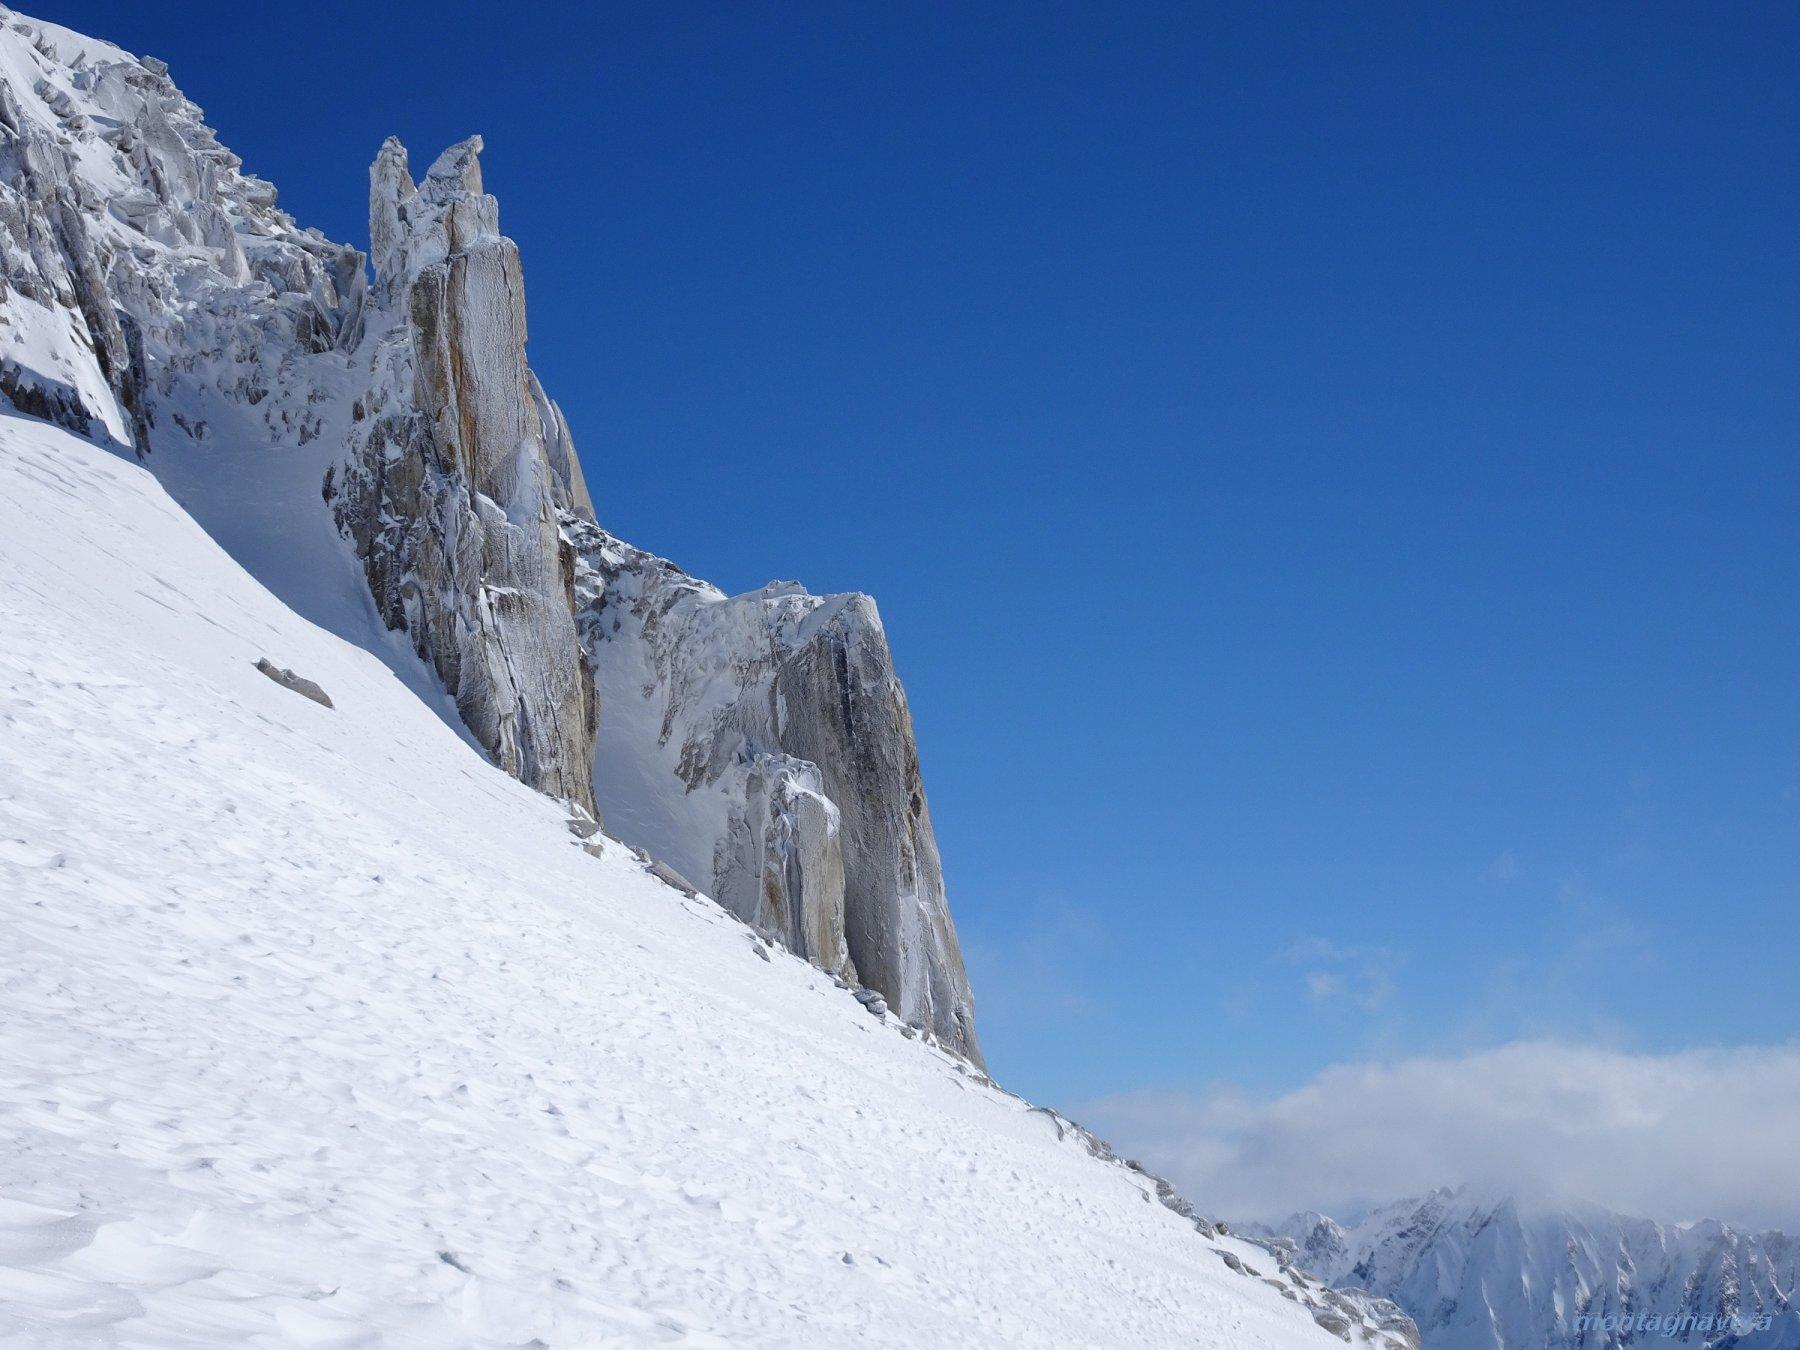 bellissime rocce sulla pala finale 2700-3000